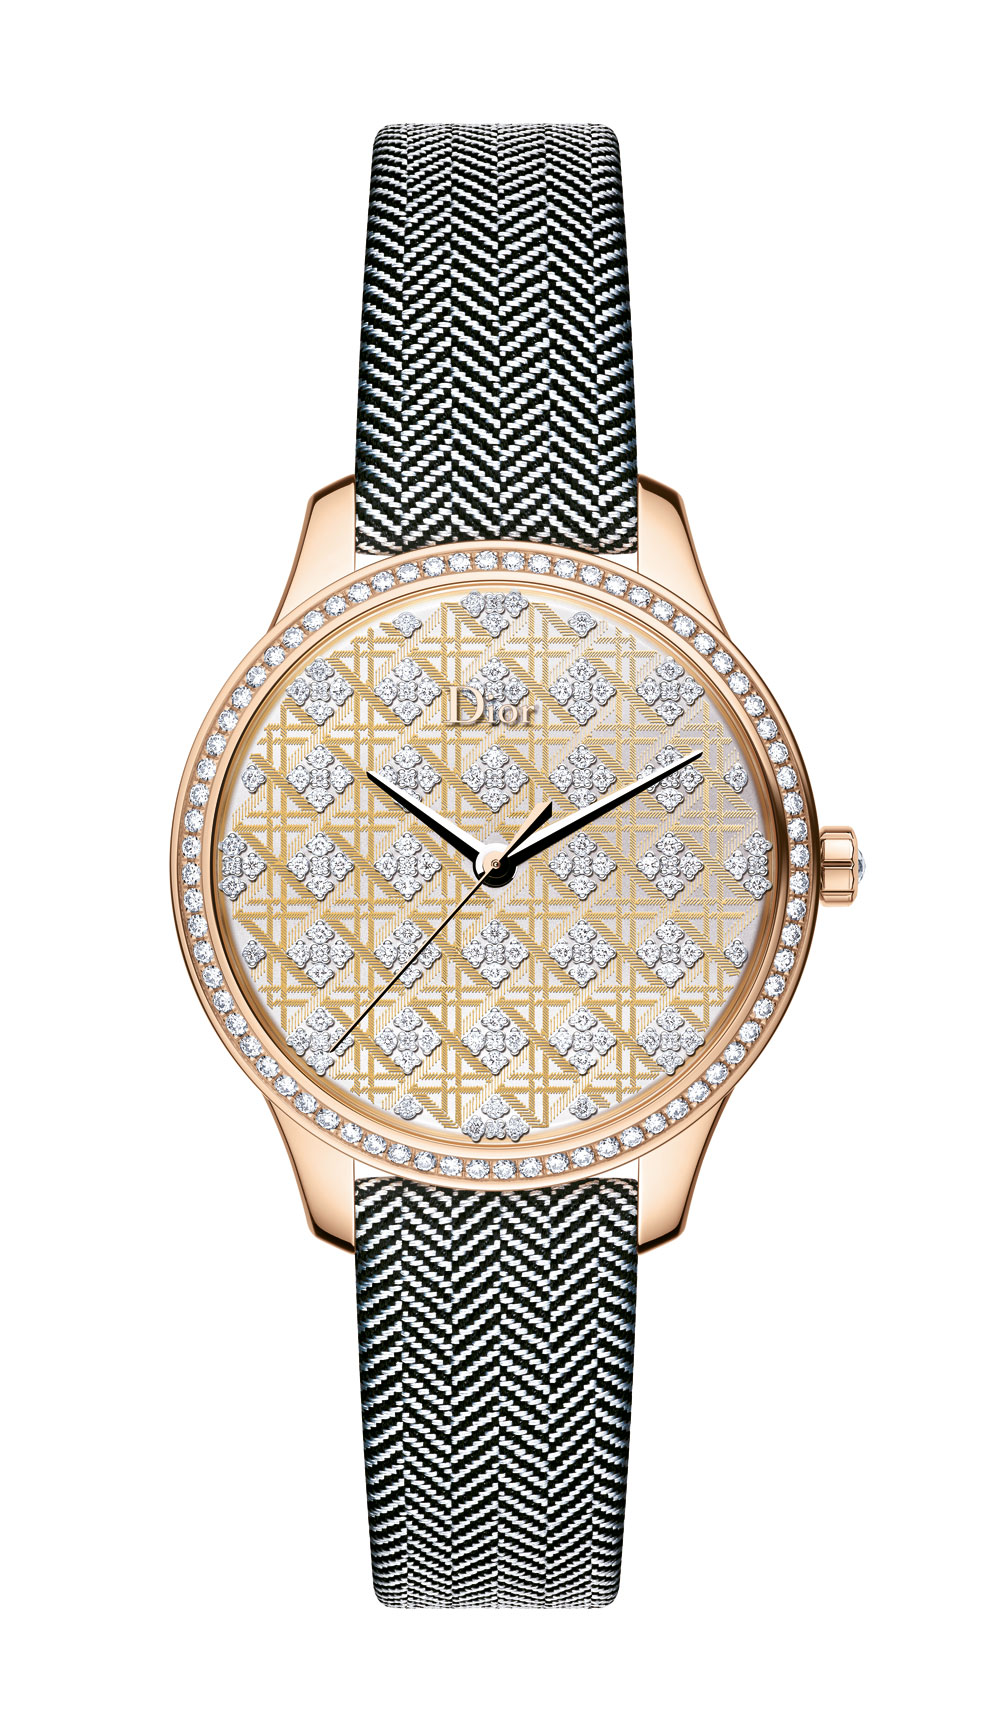 Reloj Dior VIII Mointaigne Tissage Precieux Cannage